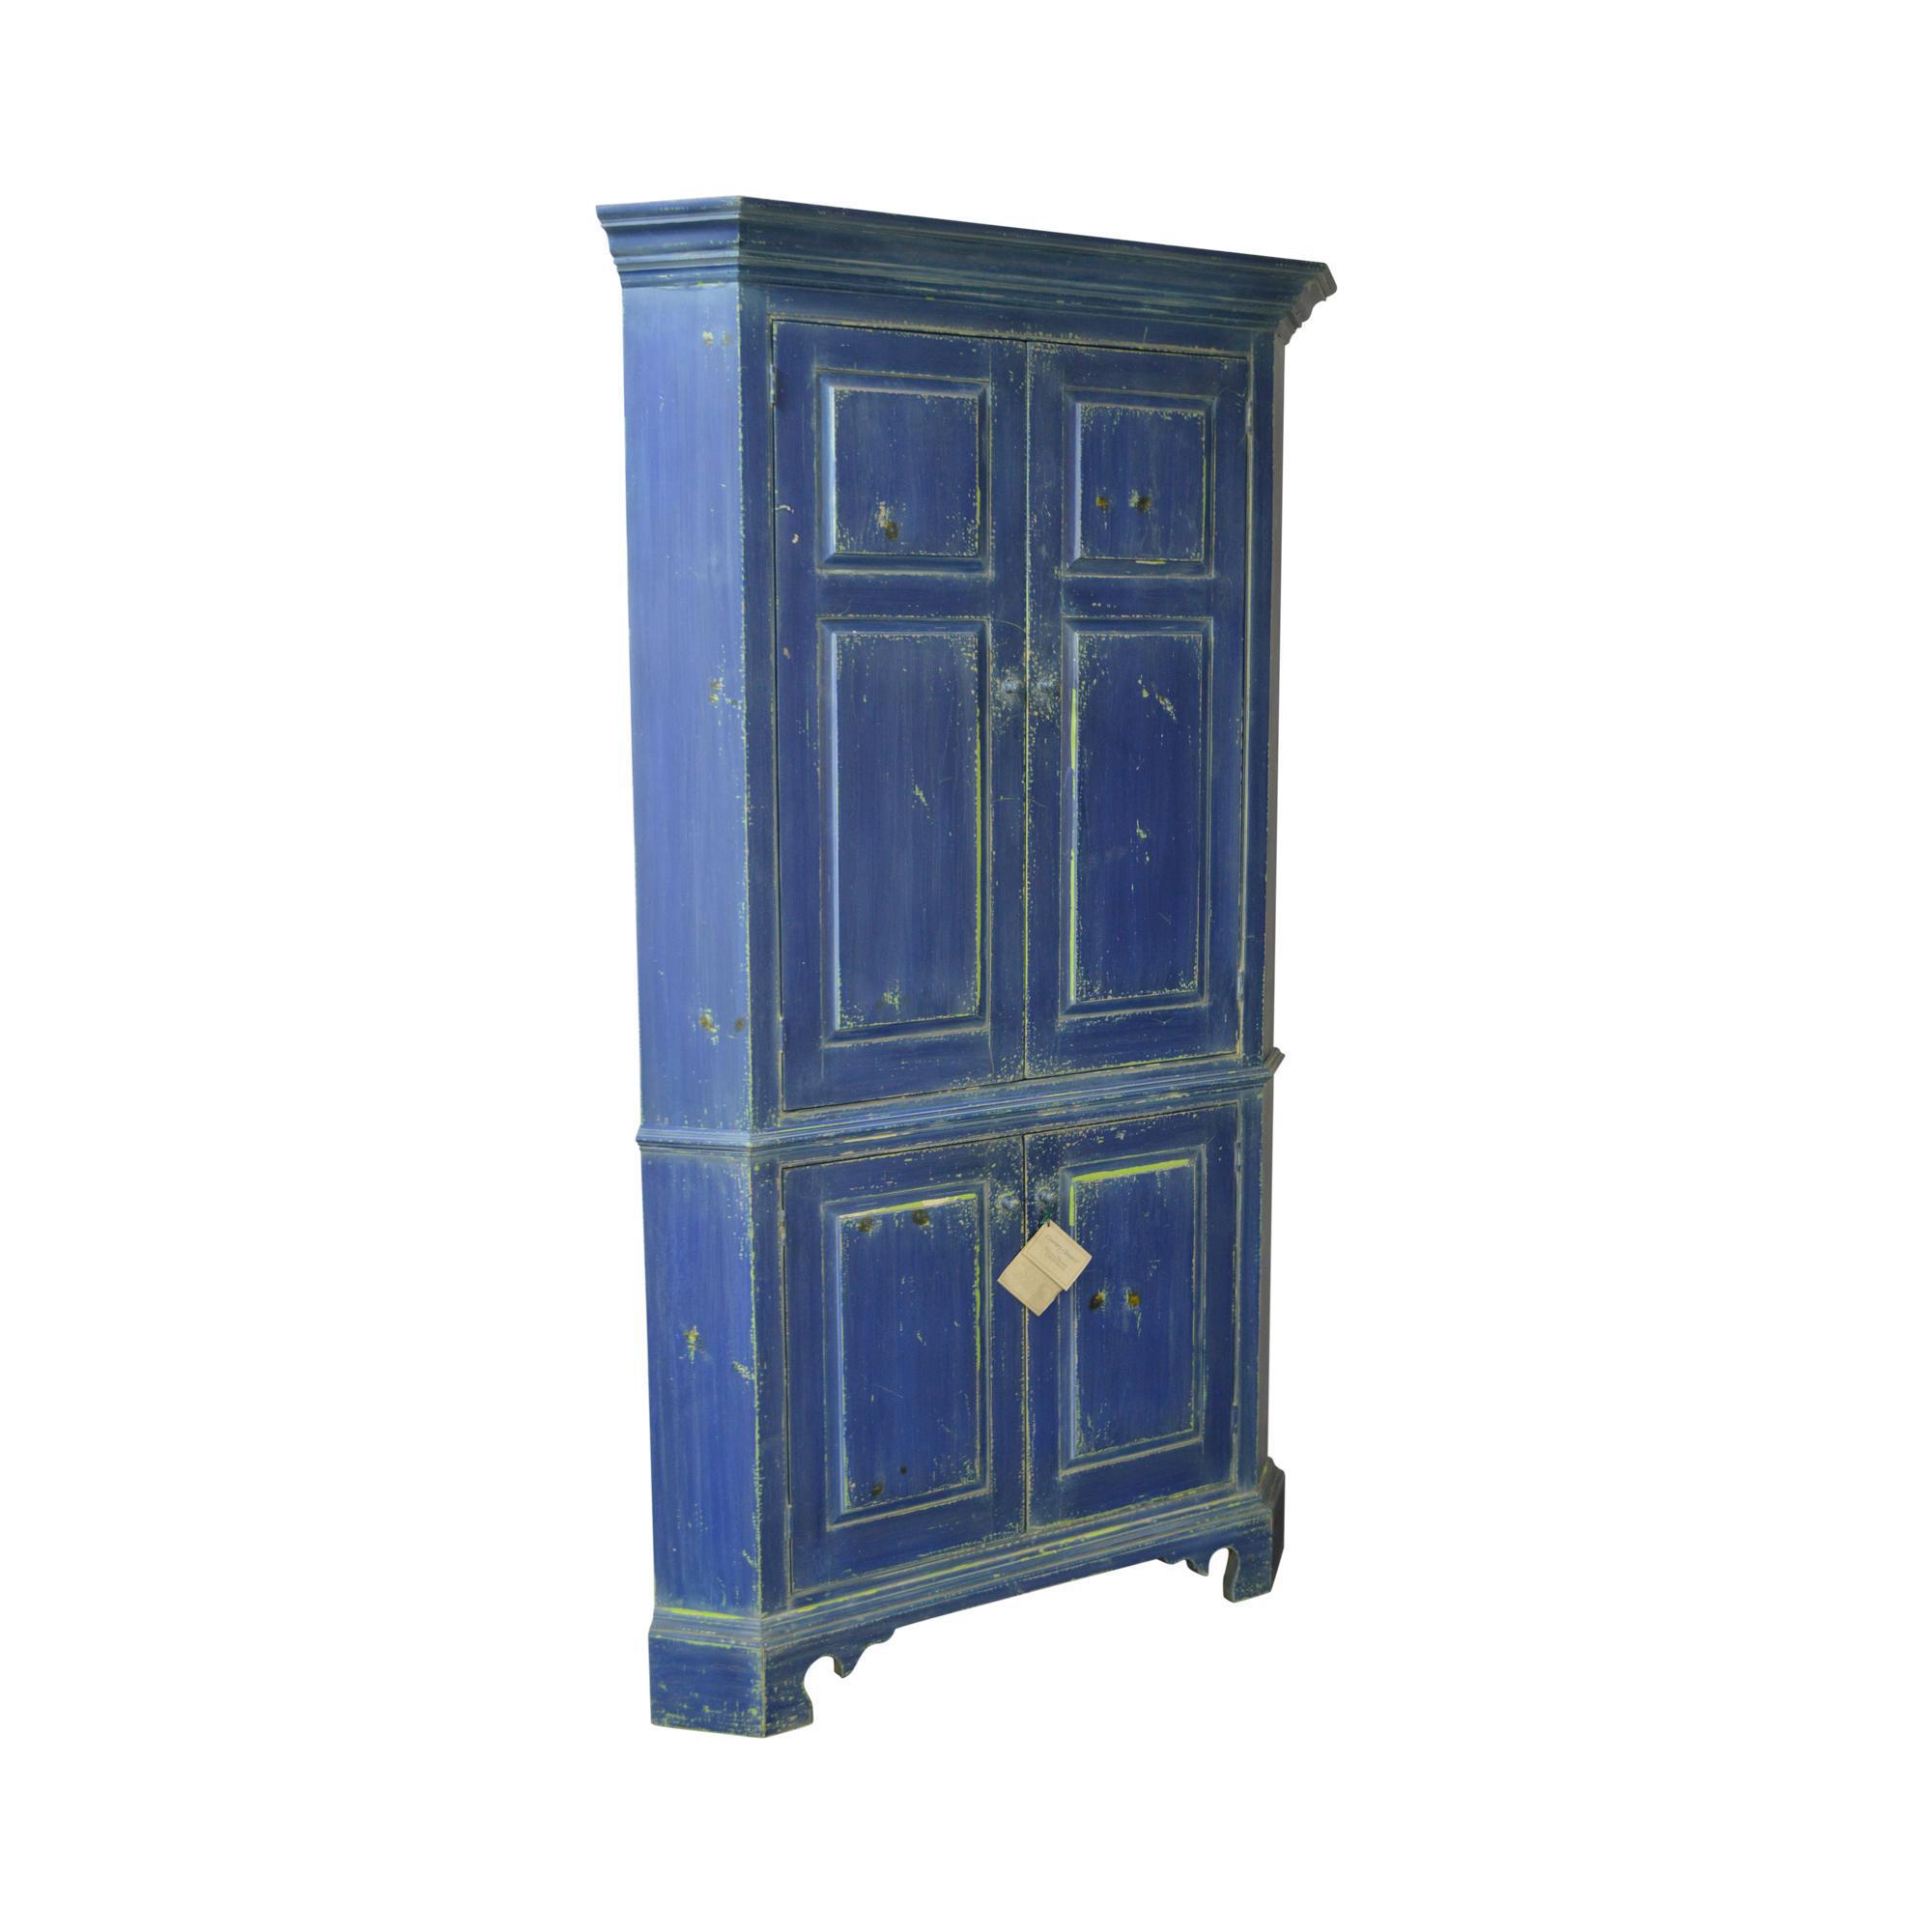 William Draper Country Classics Custom Made Blue Painted Corner Cabinet Cupboard  sc 1 st  Chairish & William Draper Country Classics Custom Made Blue Painted Corner ...